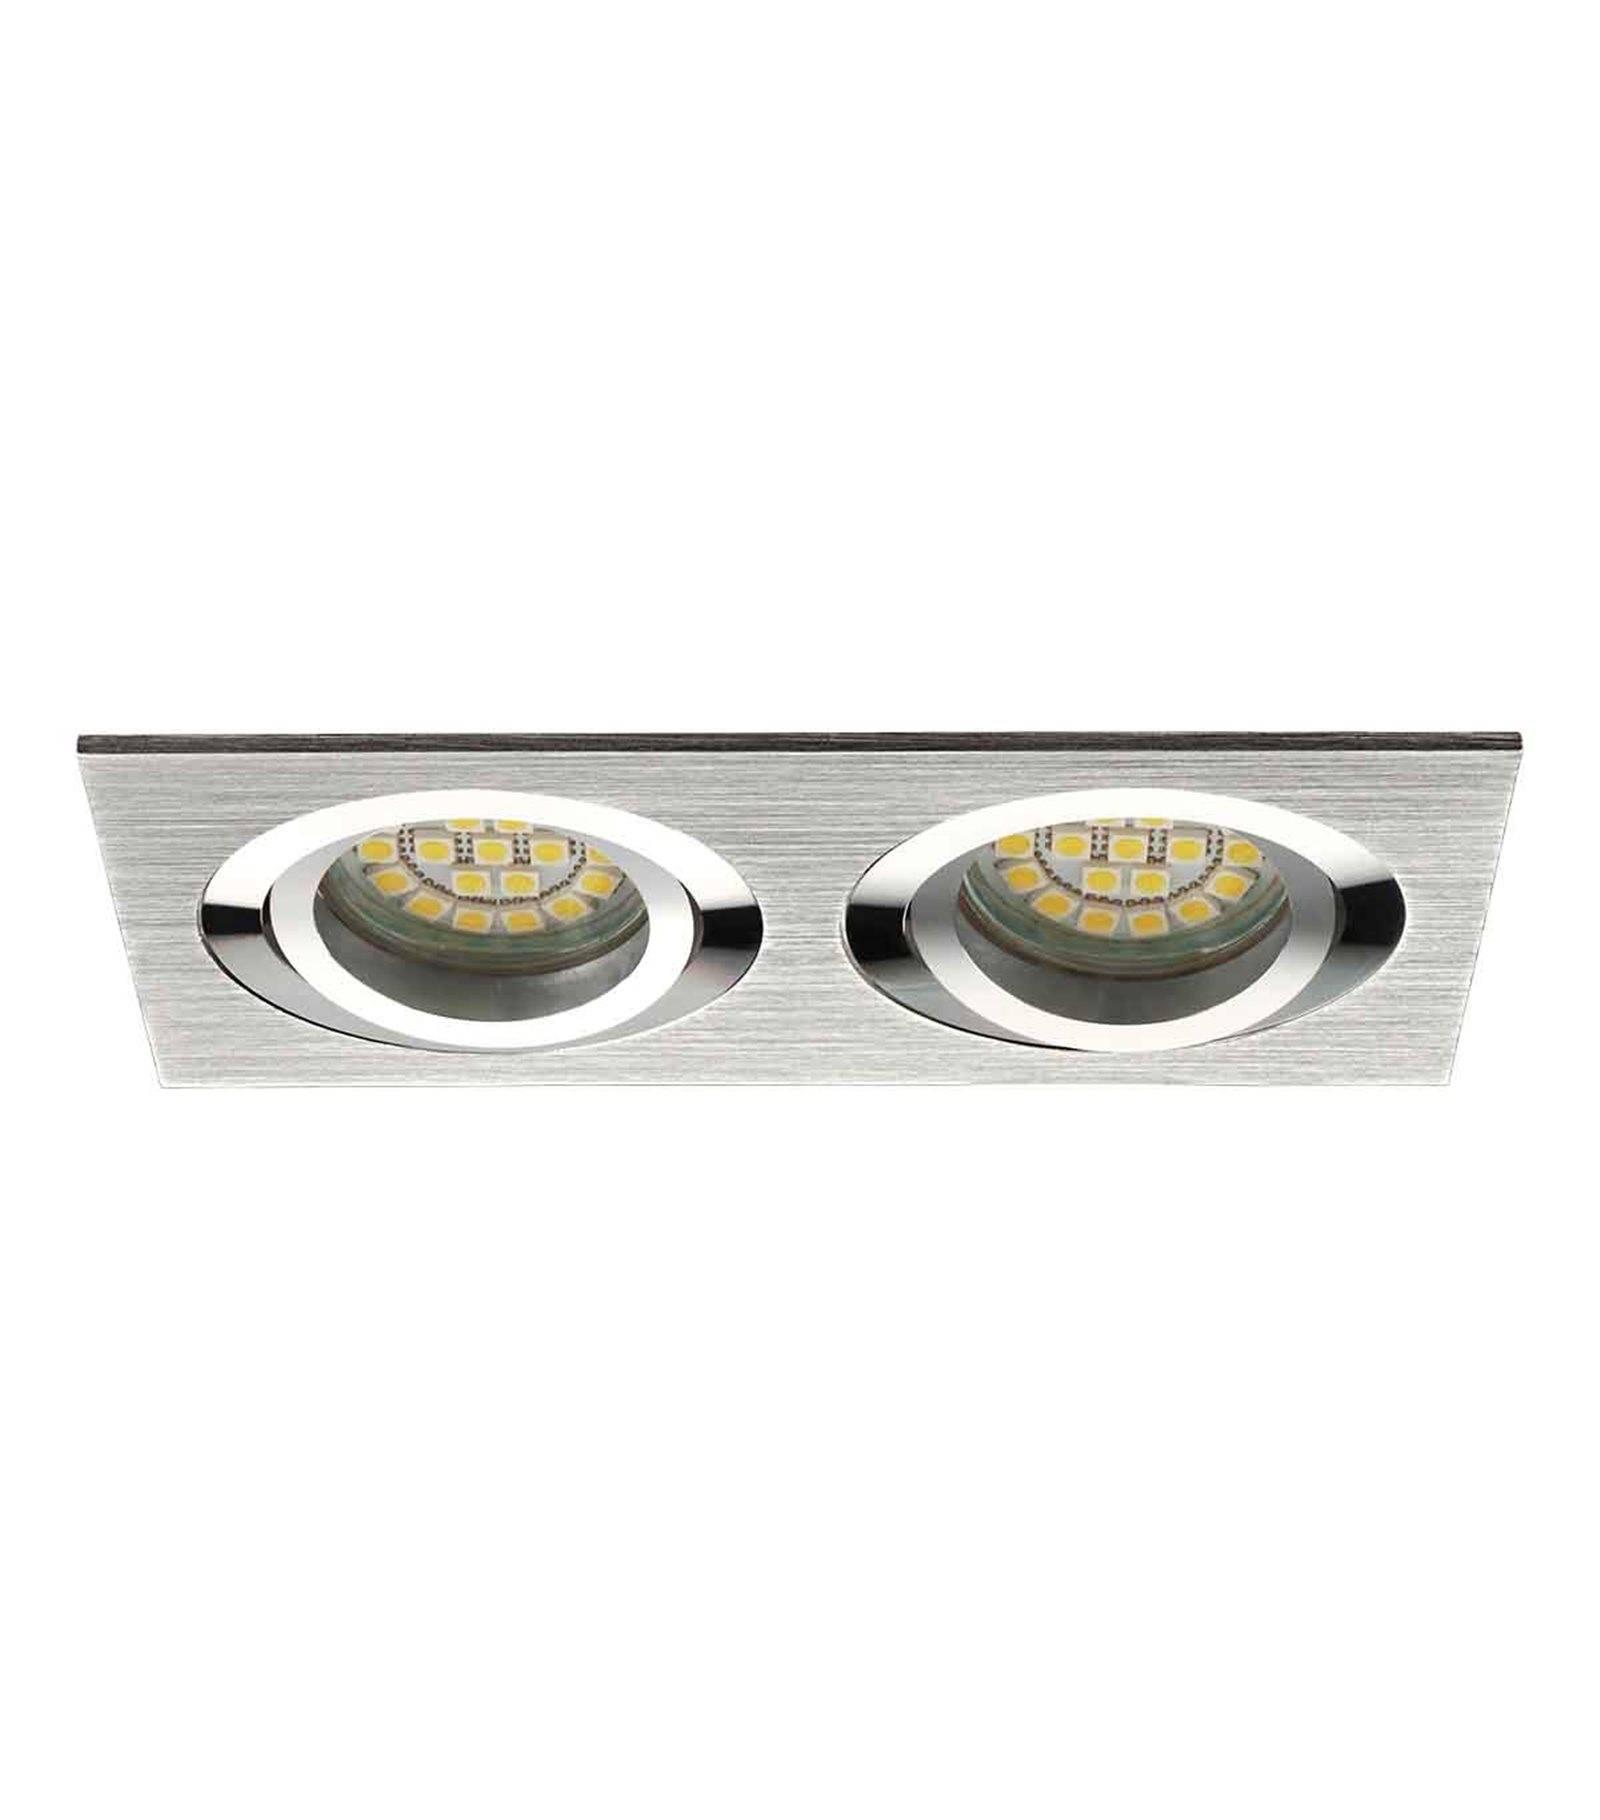 spot encastrable plafonnier seidy aluminium bross r ctangulaire 2 spots gu5 3 gu10 ip20. Black Bedroom Furniture Sets. Home Design Ideas